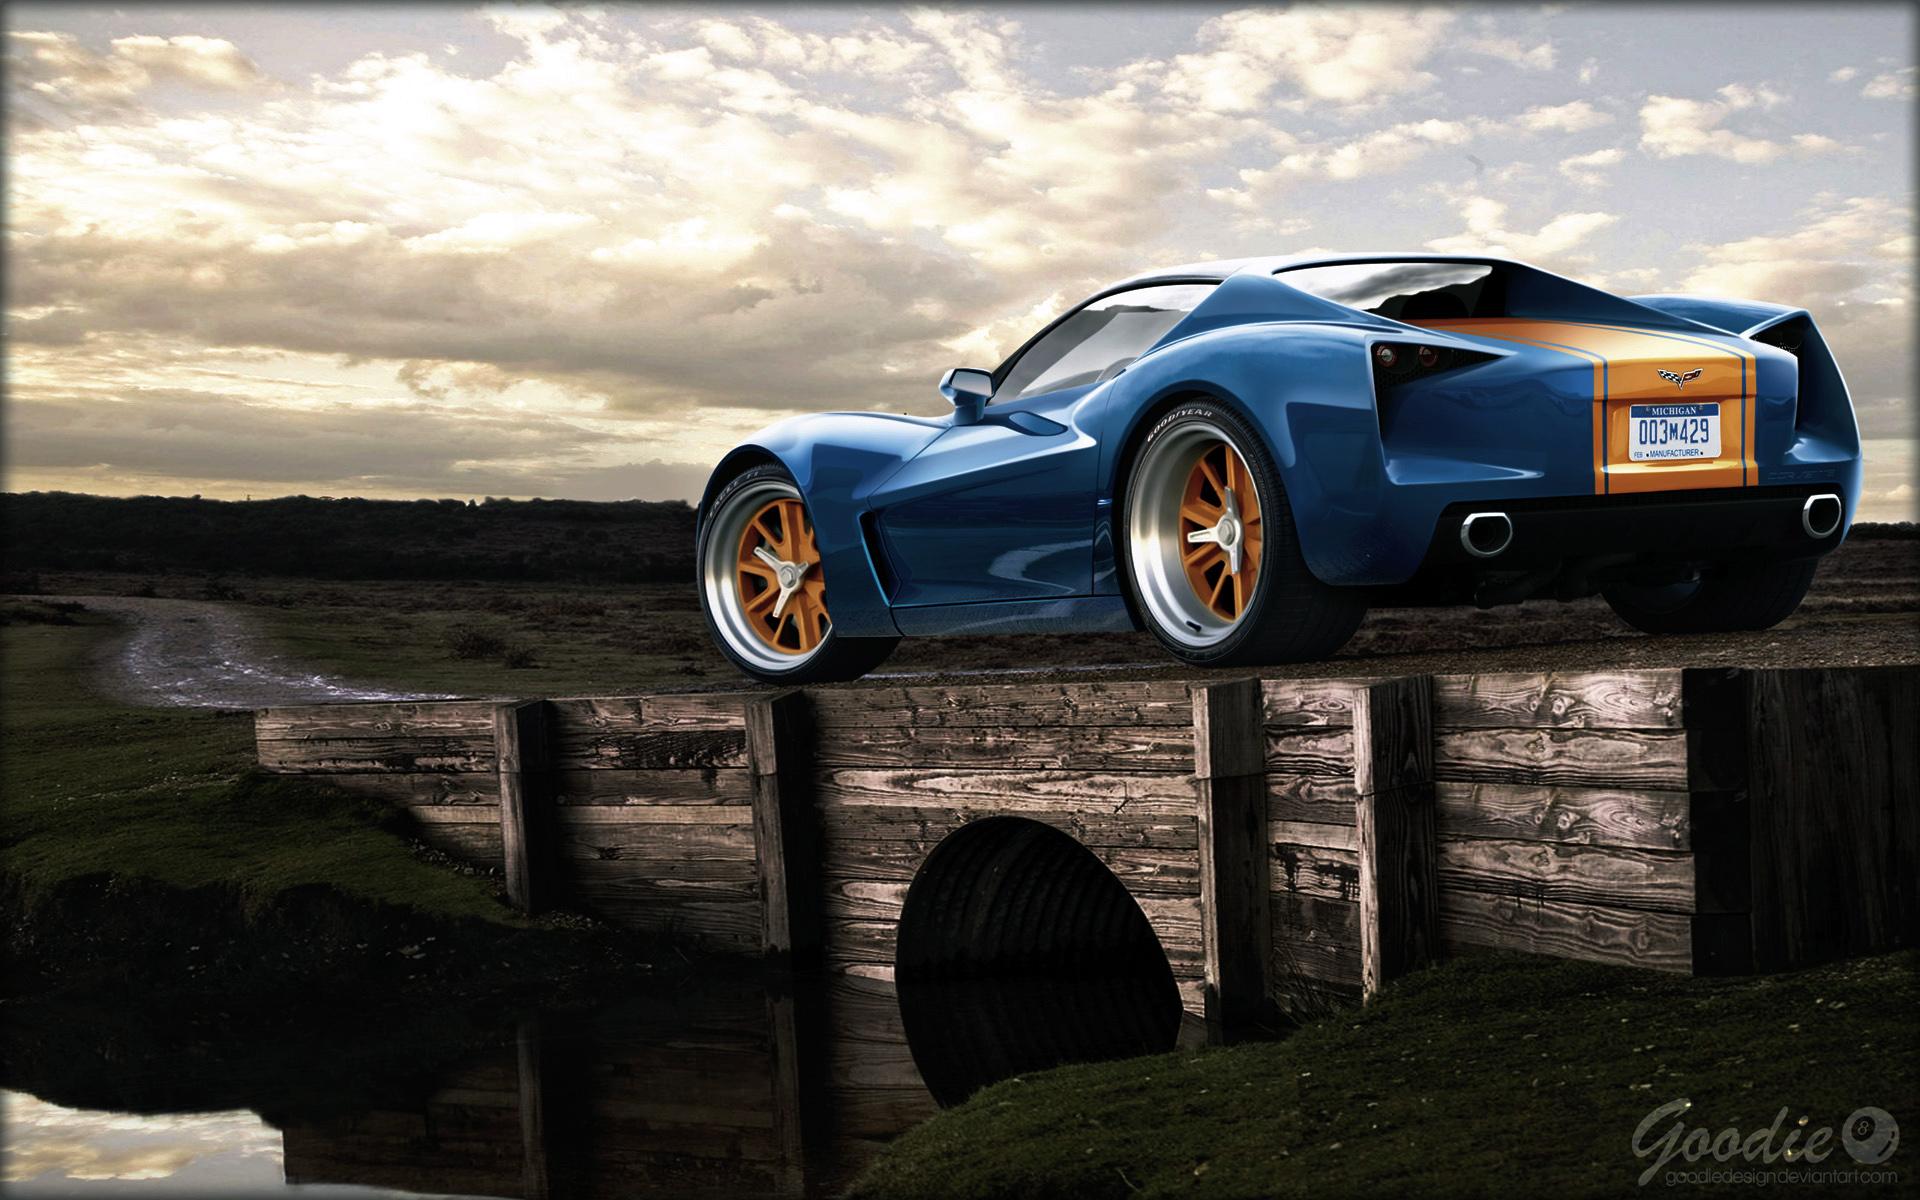 Corvette Stingray Hd Wallpaper Background Image 1920x1200 Id